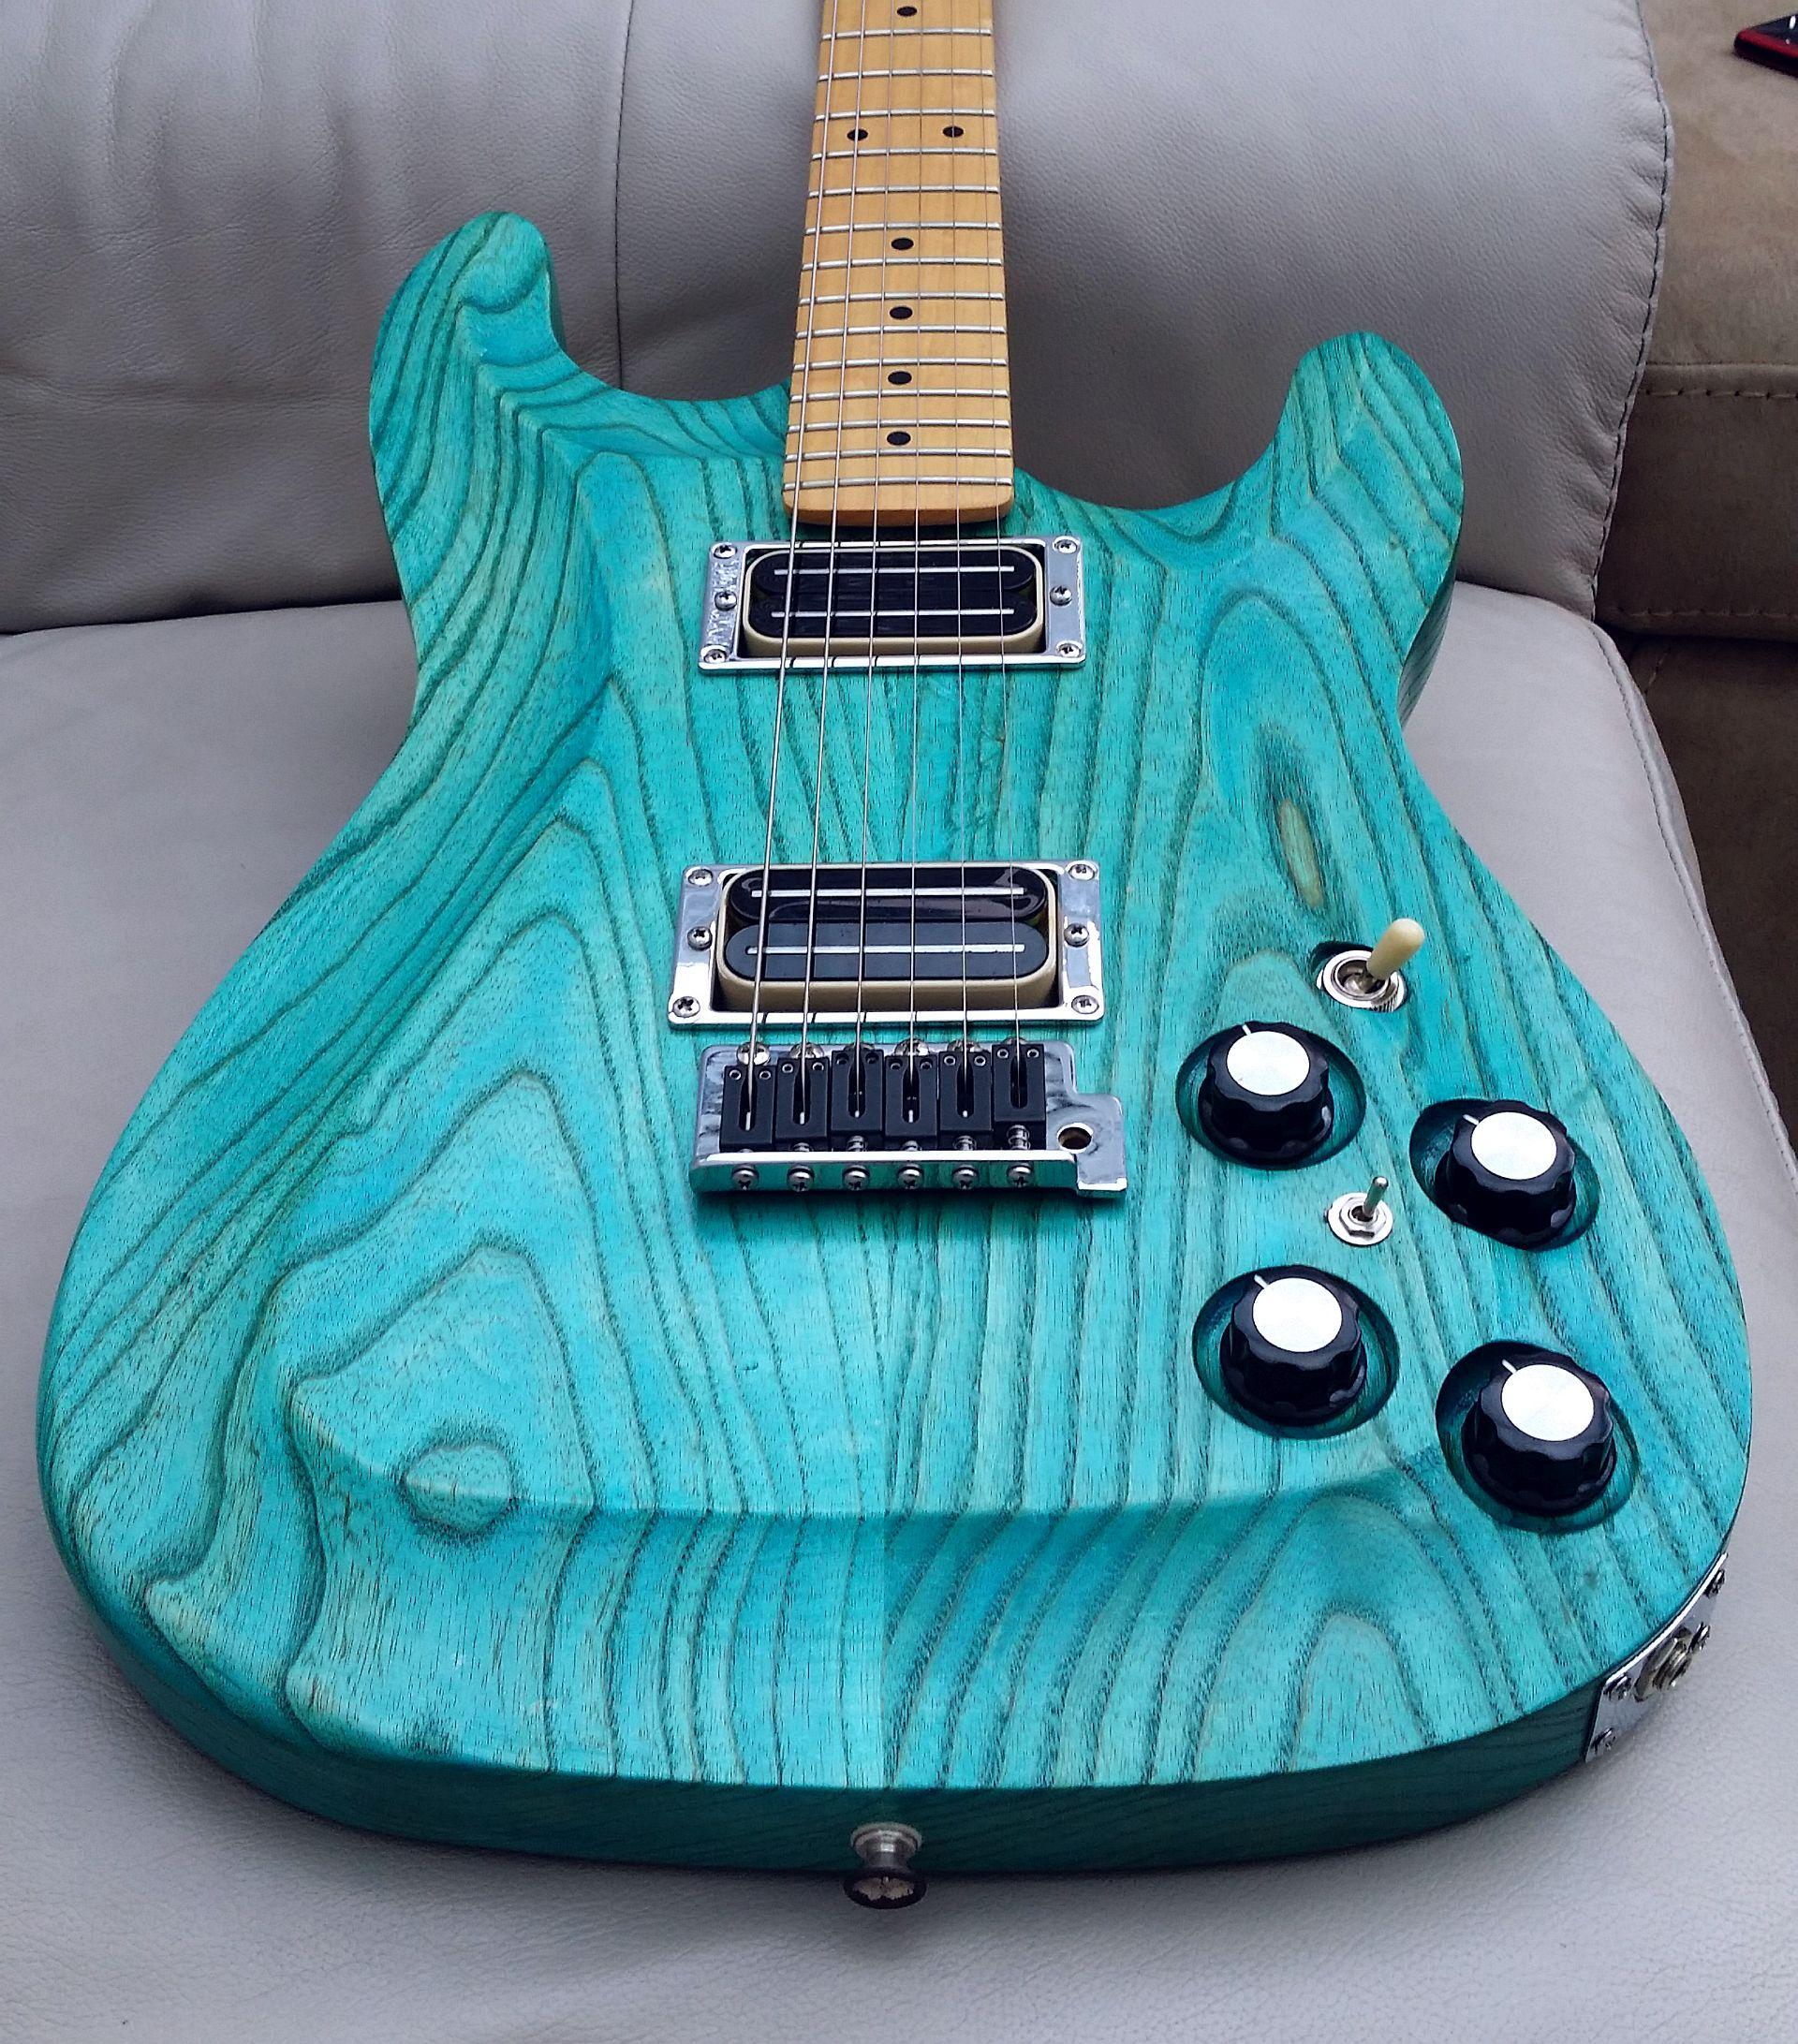 Finishing diy kits wudtone custom guitar innovation